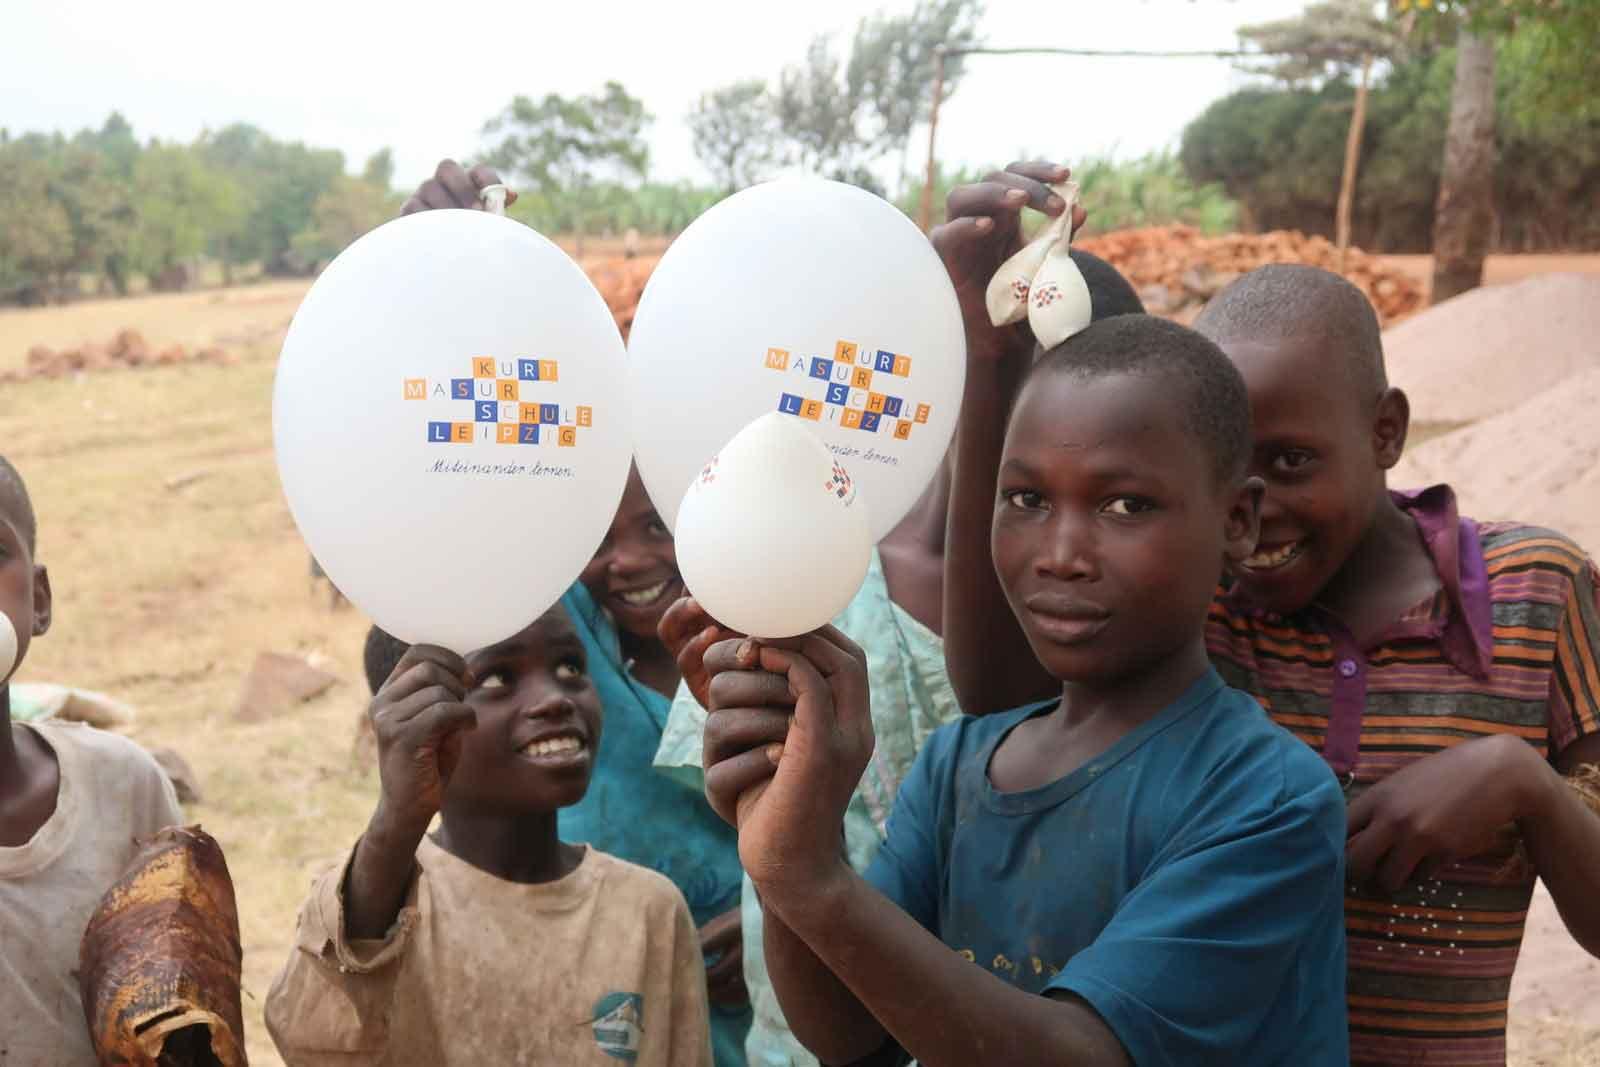 TEAMBRENNER spendet für Kurt Masur Schule Leipzig Freude in Tansania